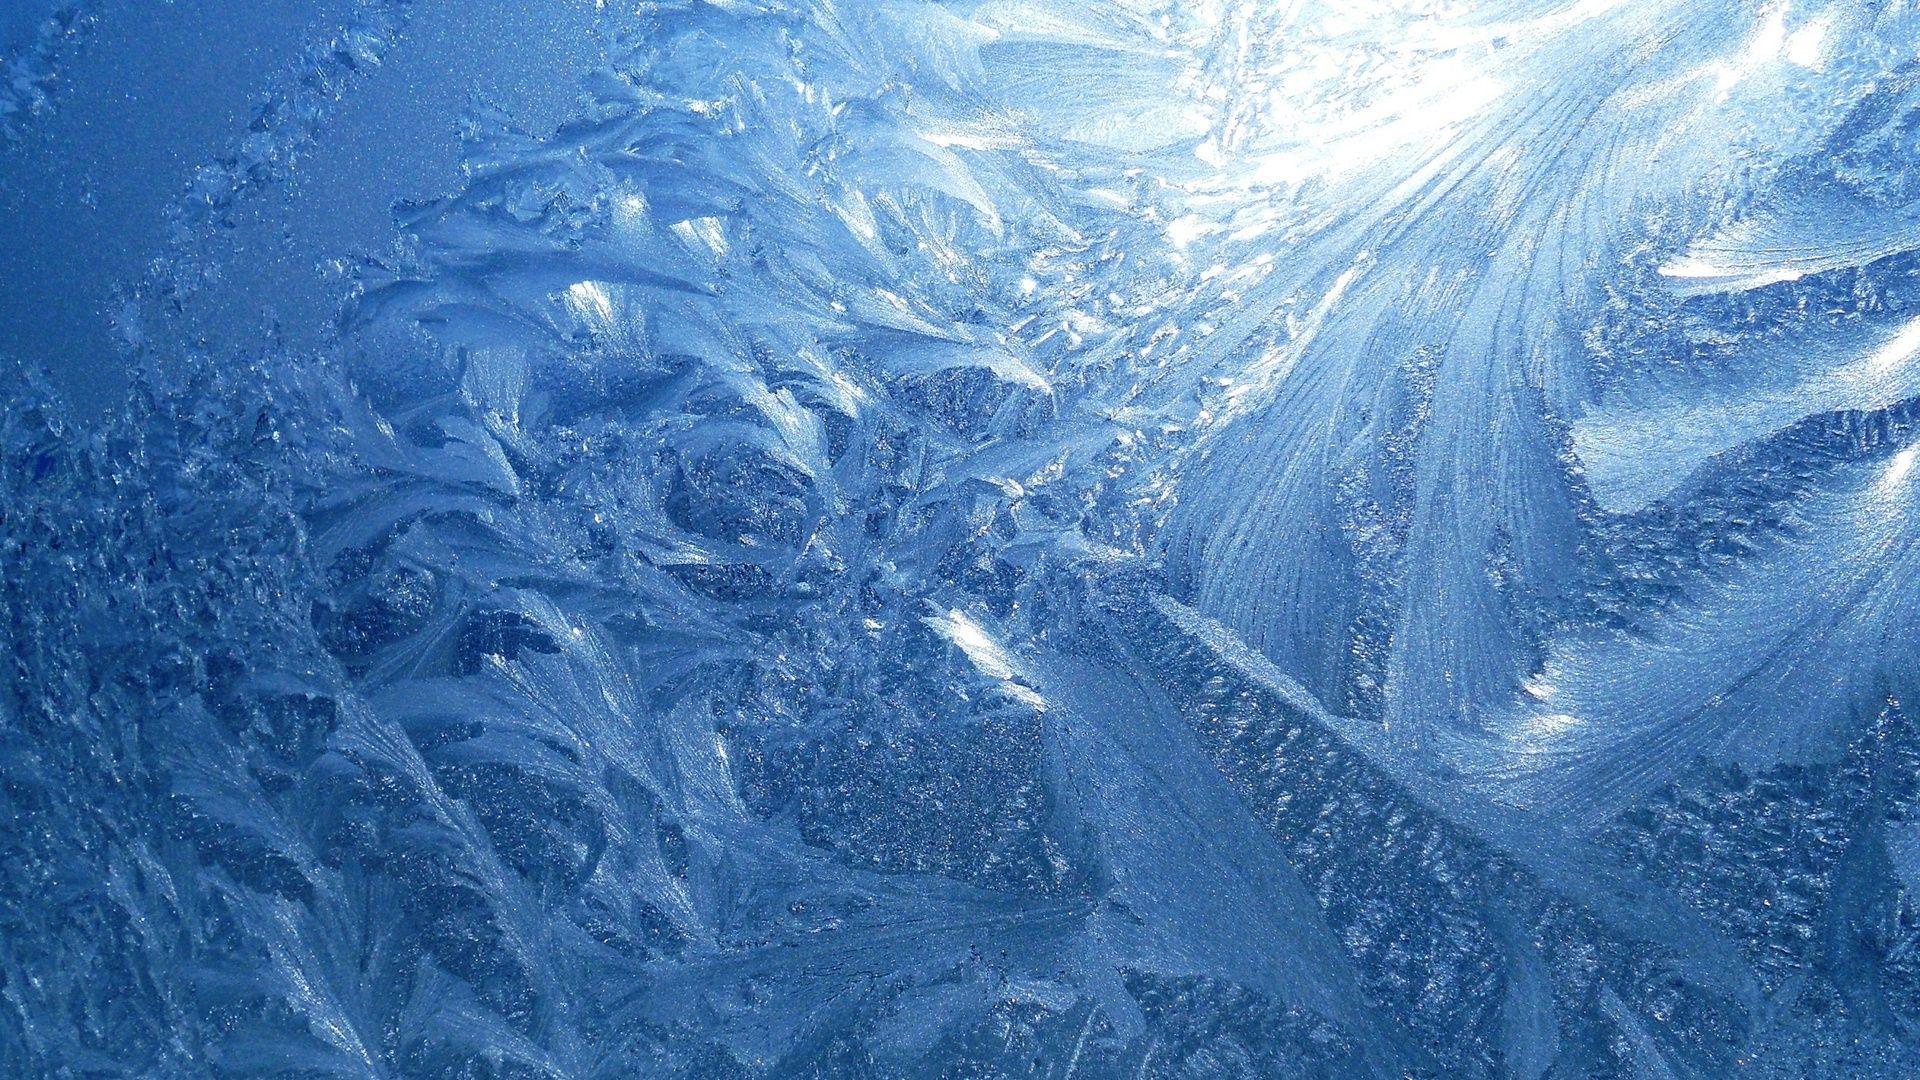 Winter Patterns On The Window Free Wallpaper